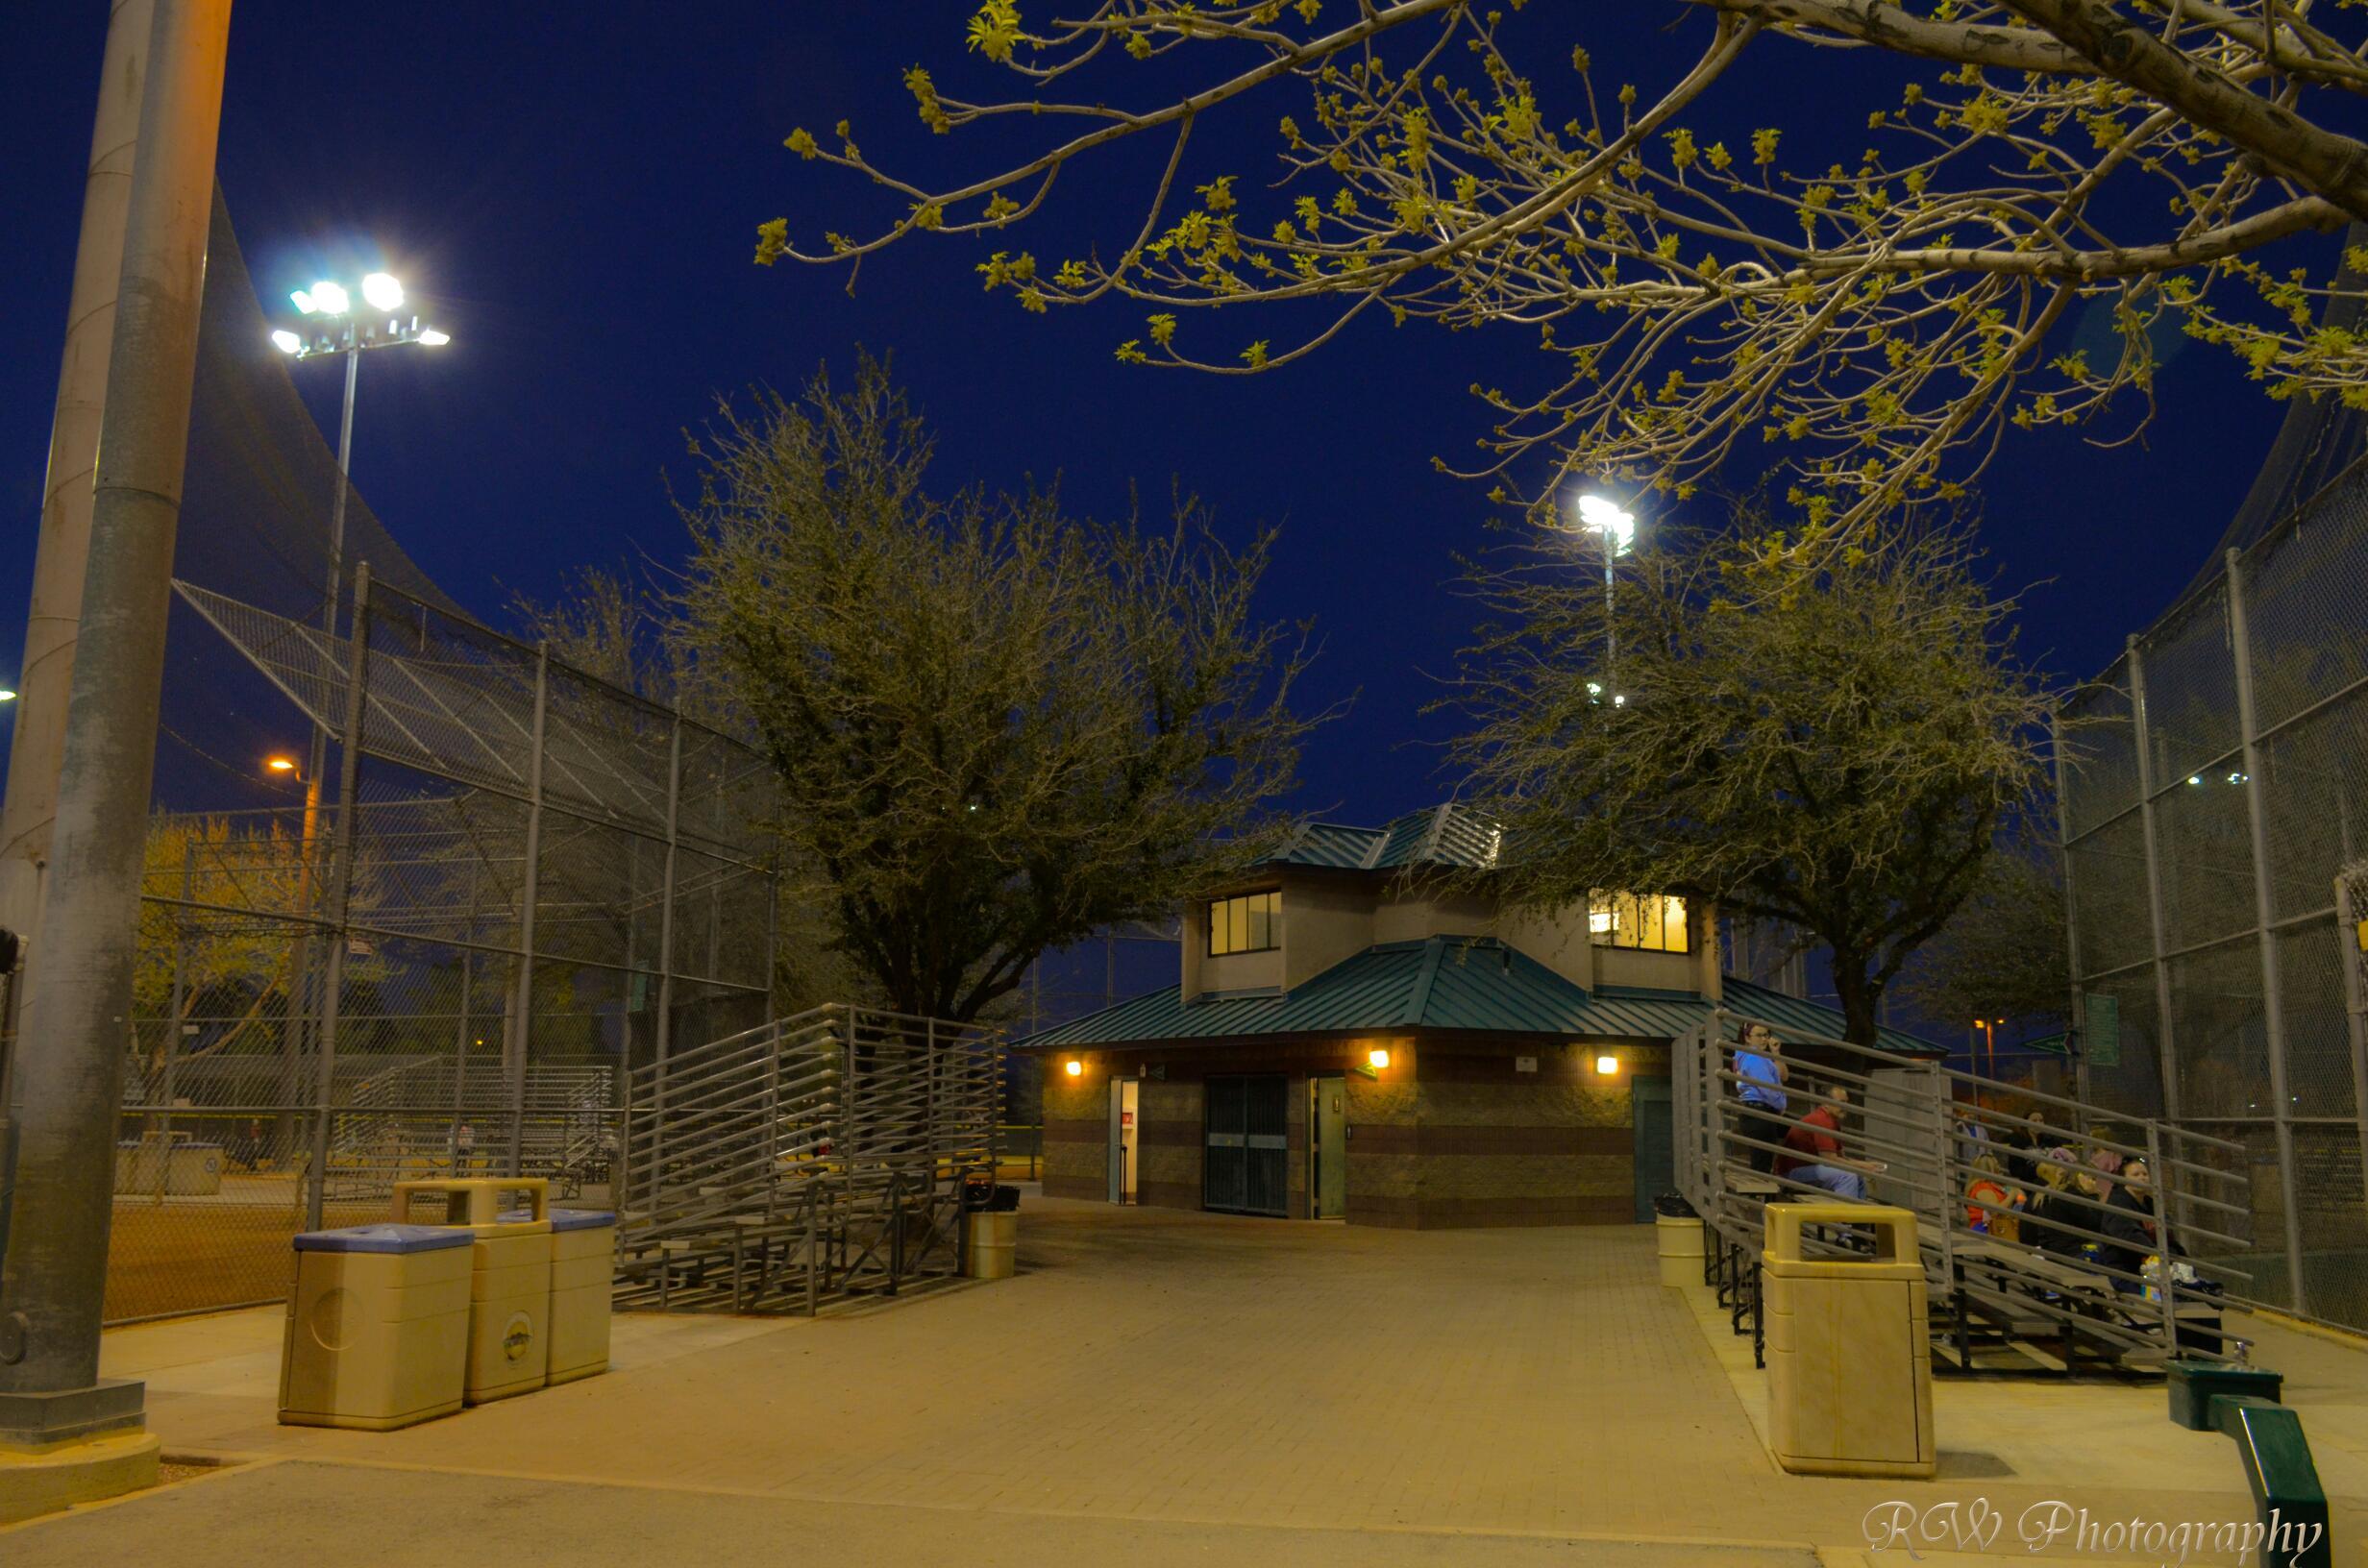 Night Photography Arroyo Grande Sport Complex